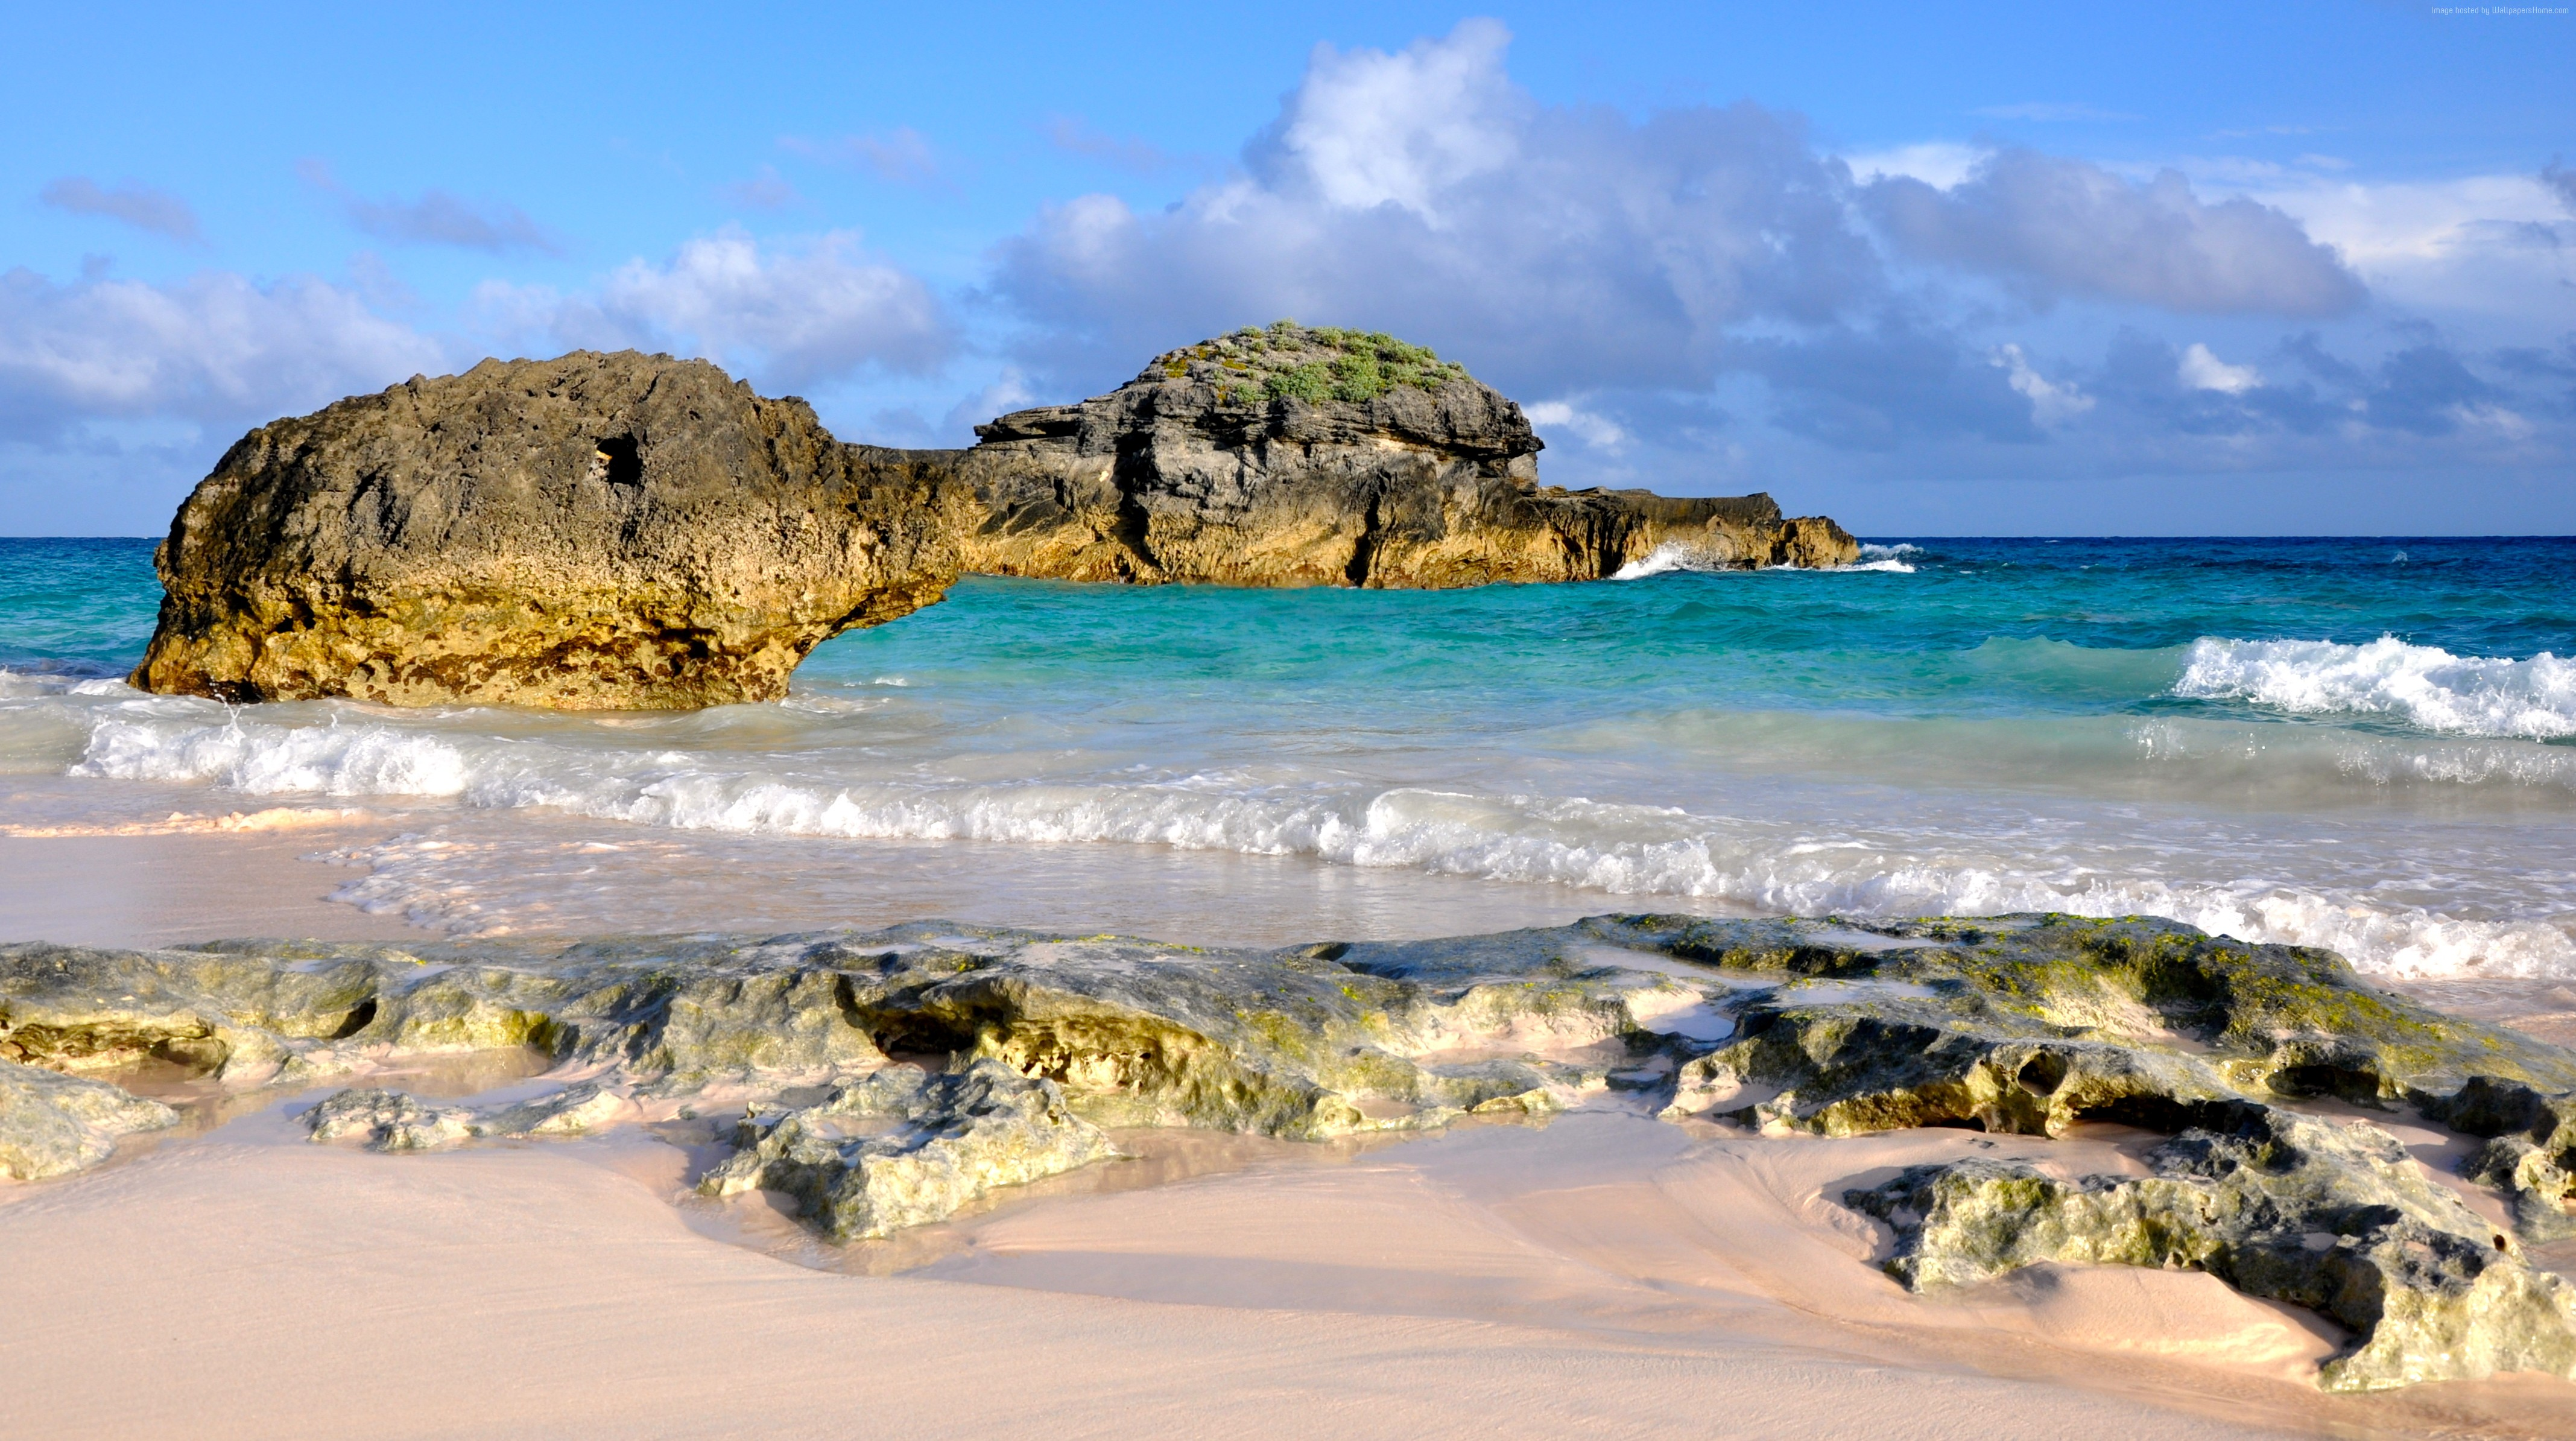 Horseshoe Bay Beach in Bermuda 4k Ultra HD Wallpaper Background 4271x2389